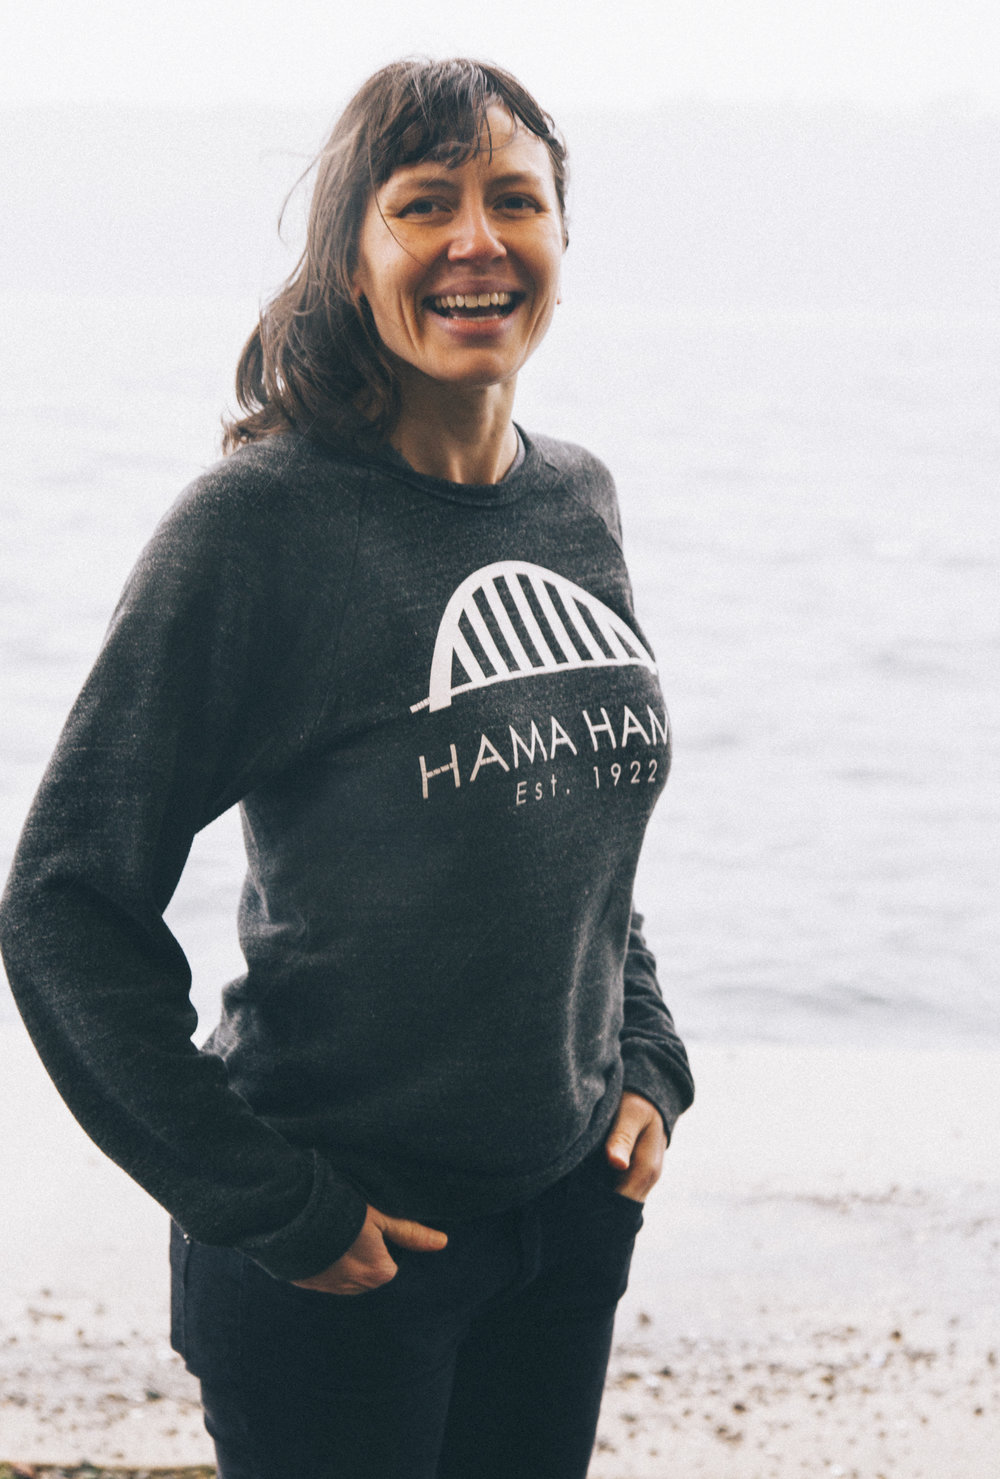 Hama Hama Swag (sweatshirt).